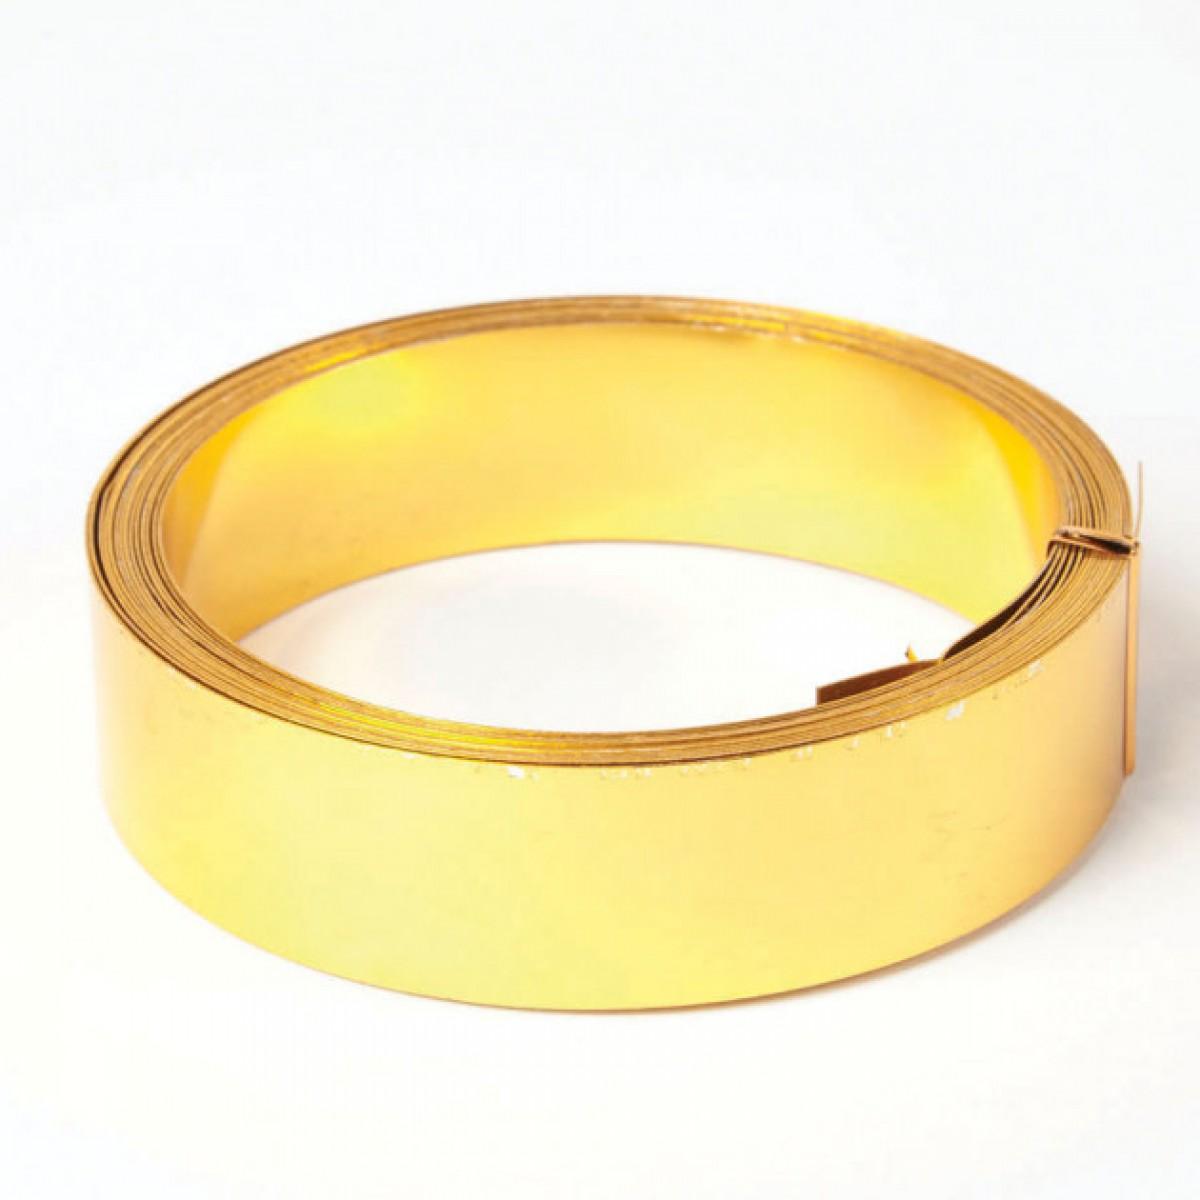 Flat Aluminium Wire Gold 30mmx0.5mmx5m 1 No